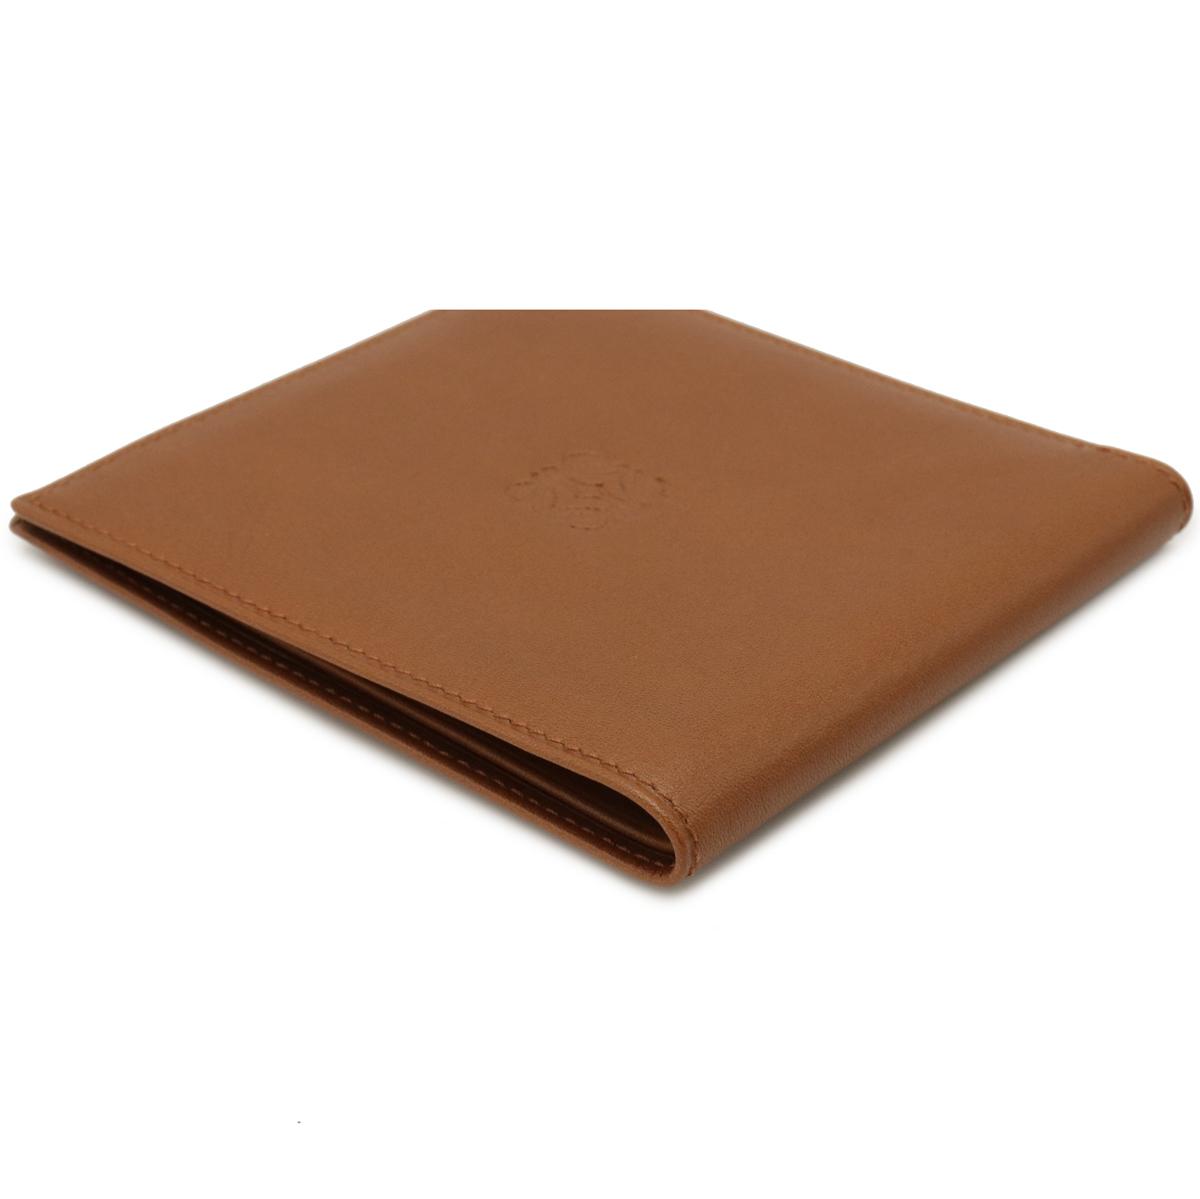 LOEWE Anagram 2 Bold Bottom Bad Fold Book Leather Brown Tea